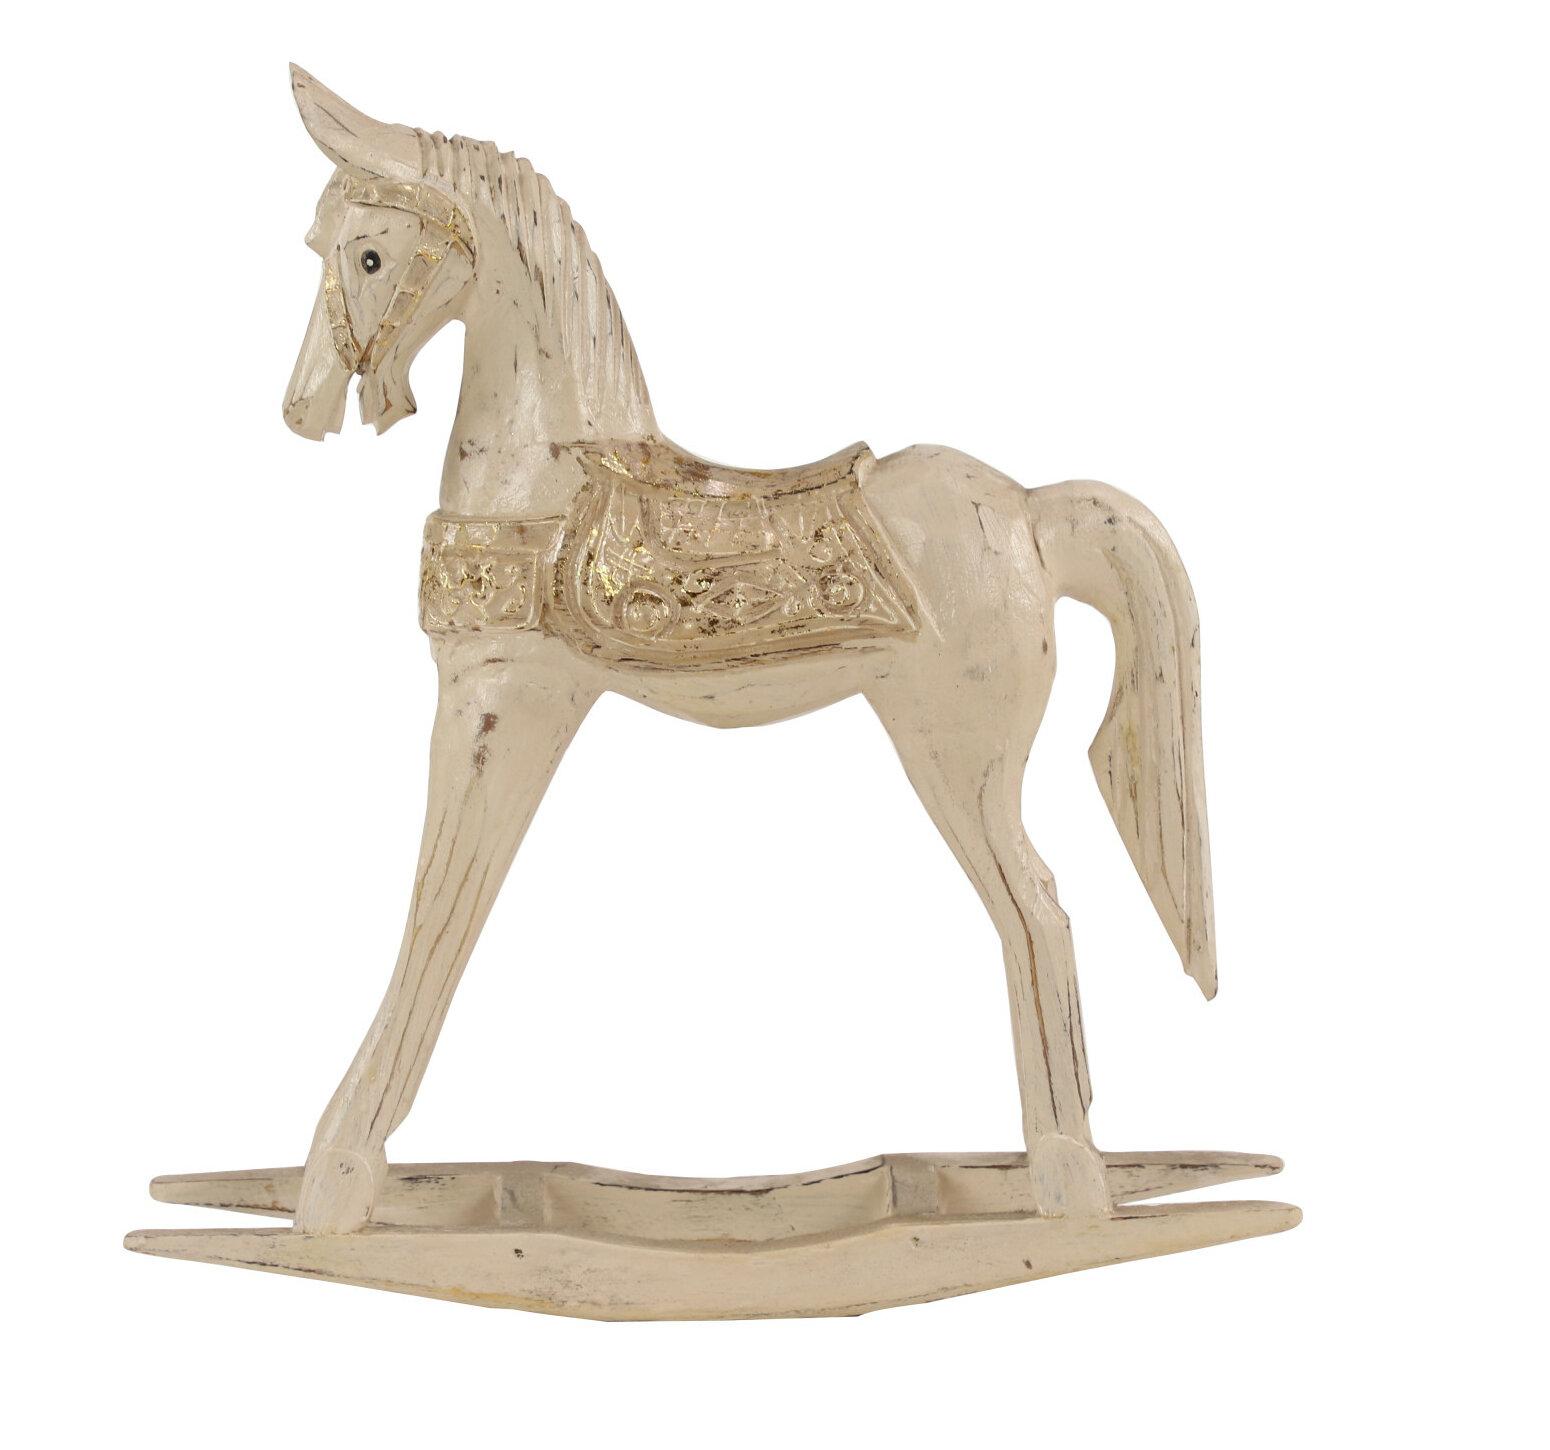 Eleanor Metallic Wooden Rocking Horse Figurine